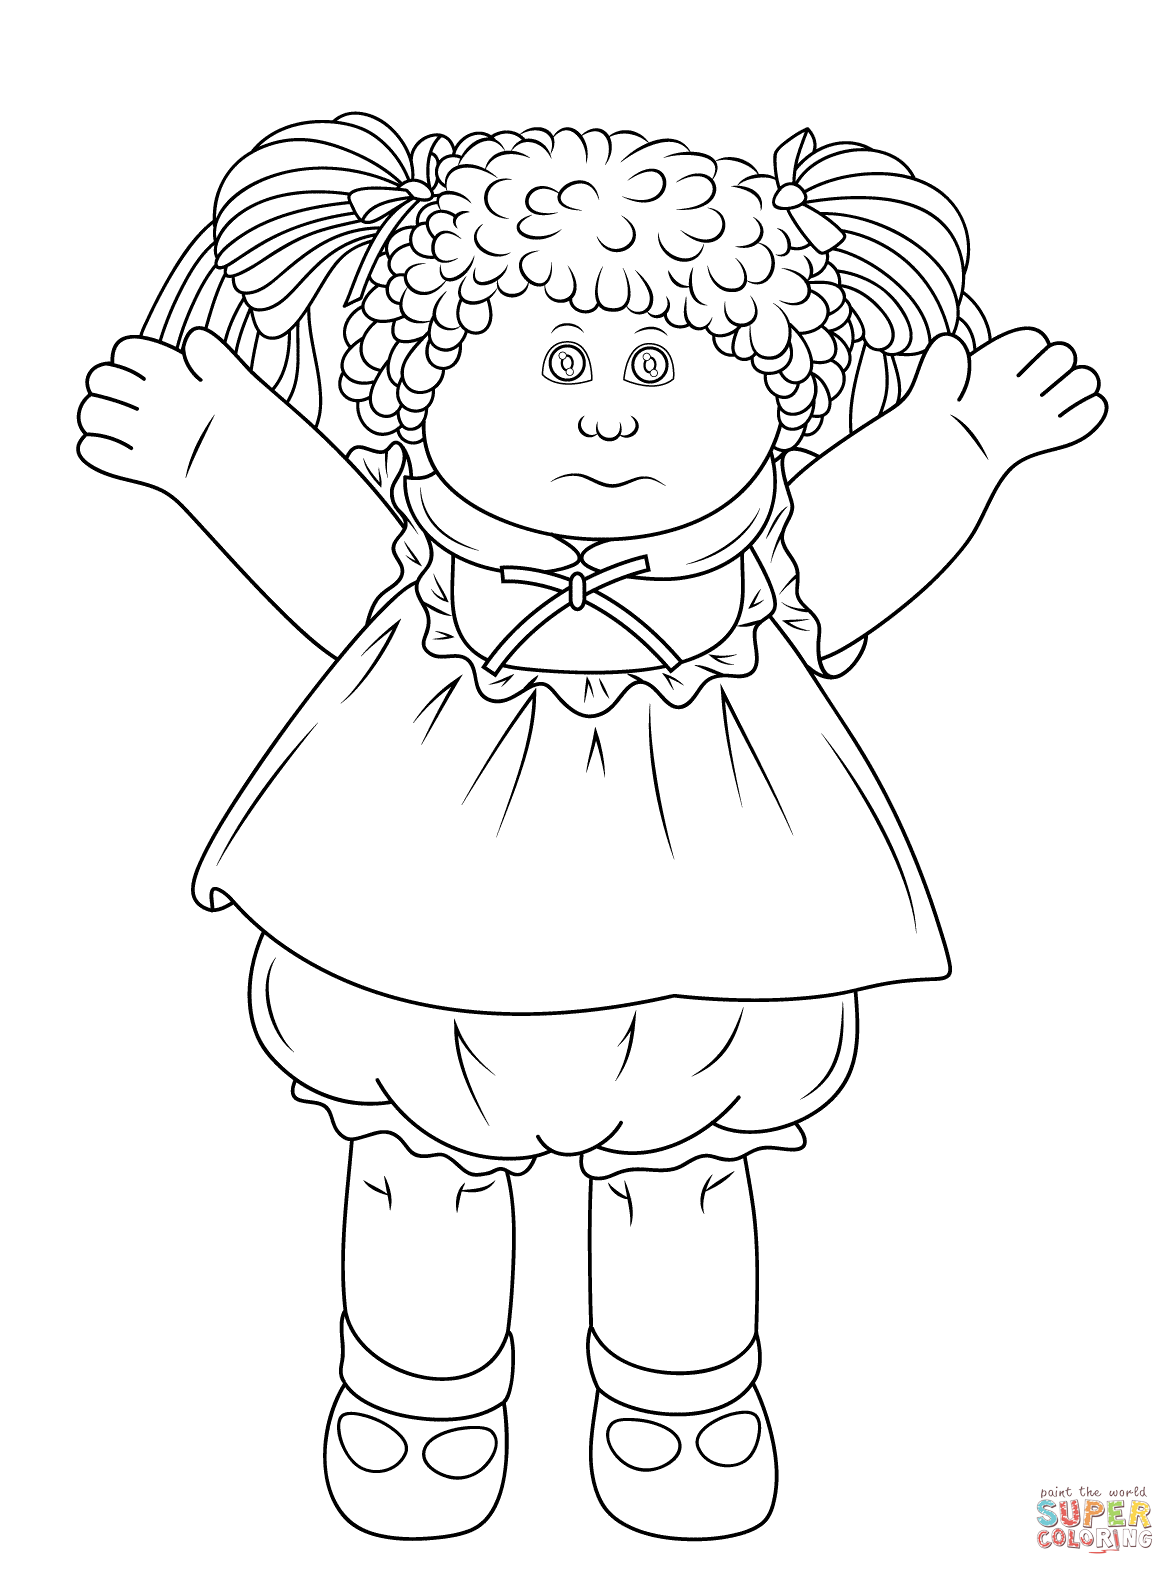 Cabbage Patch Kids - Cabbage Patch Theme = Tema De Los Cabbage Patch Kids